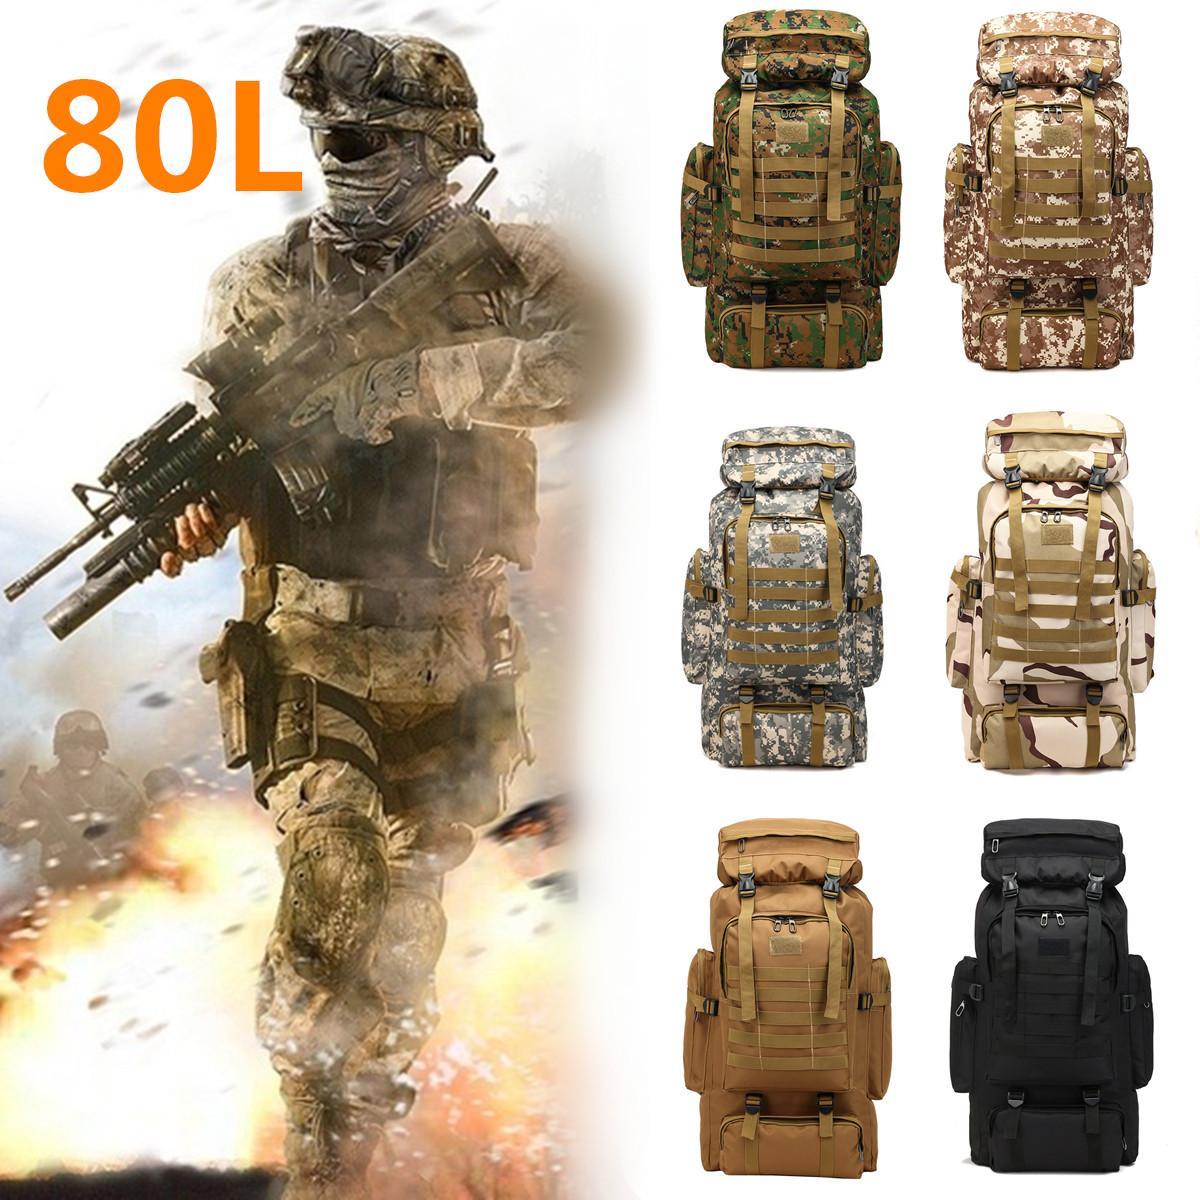 80L Large Capacity Backpack Camouflage Tactical Military Rucksacks Backpack Camping Bag Casual Travel Shoulder Bag Rucksack